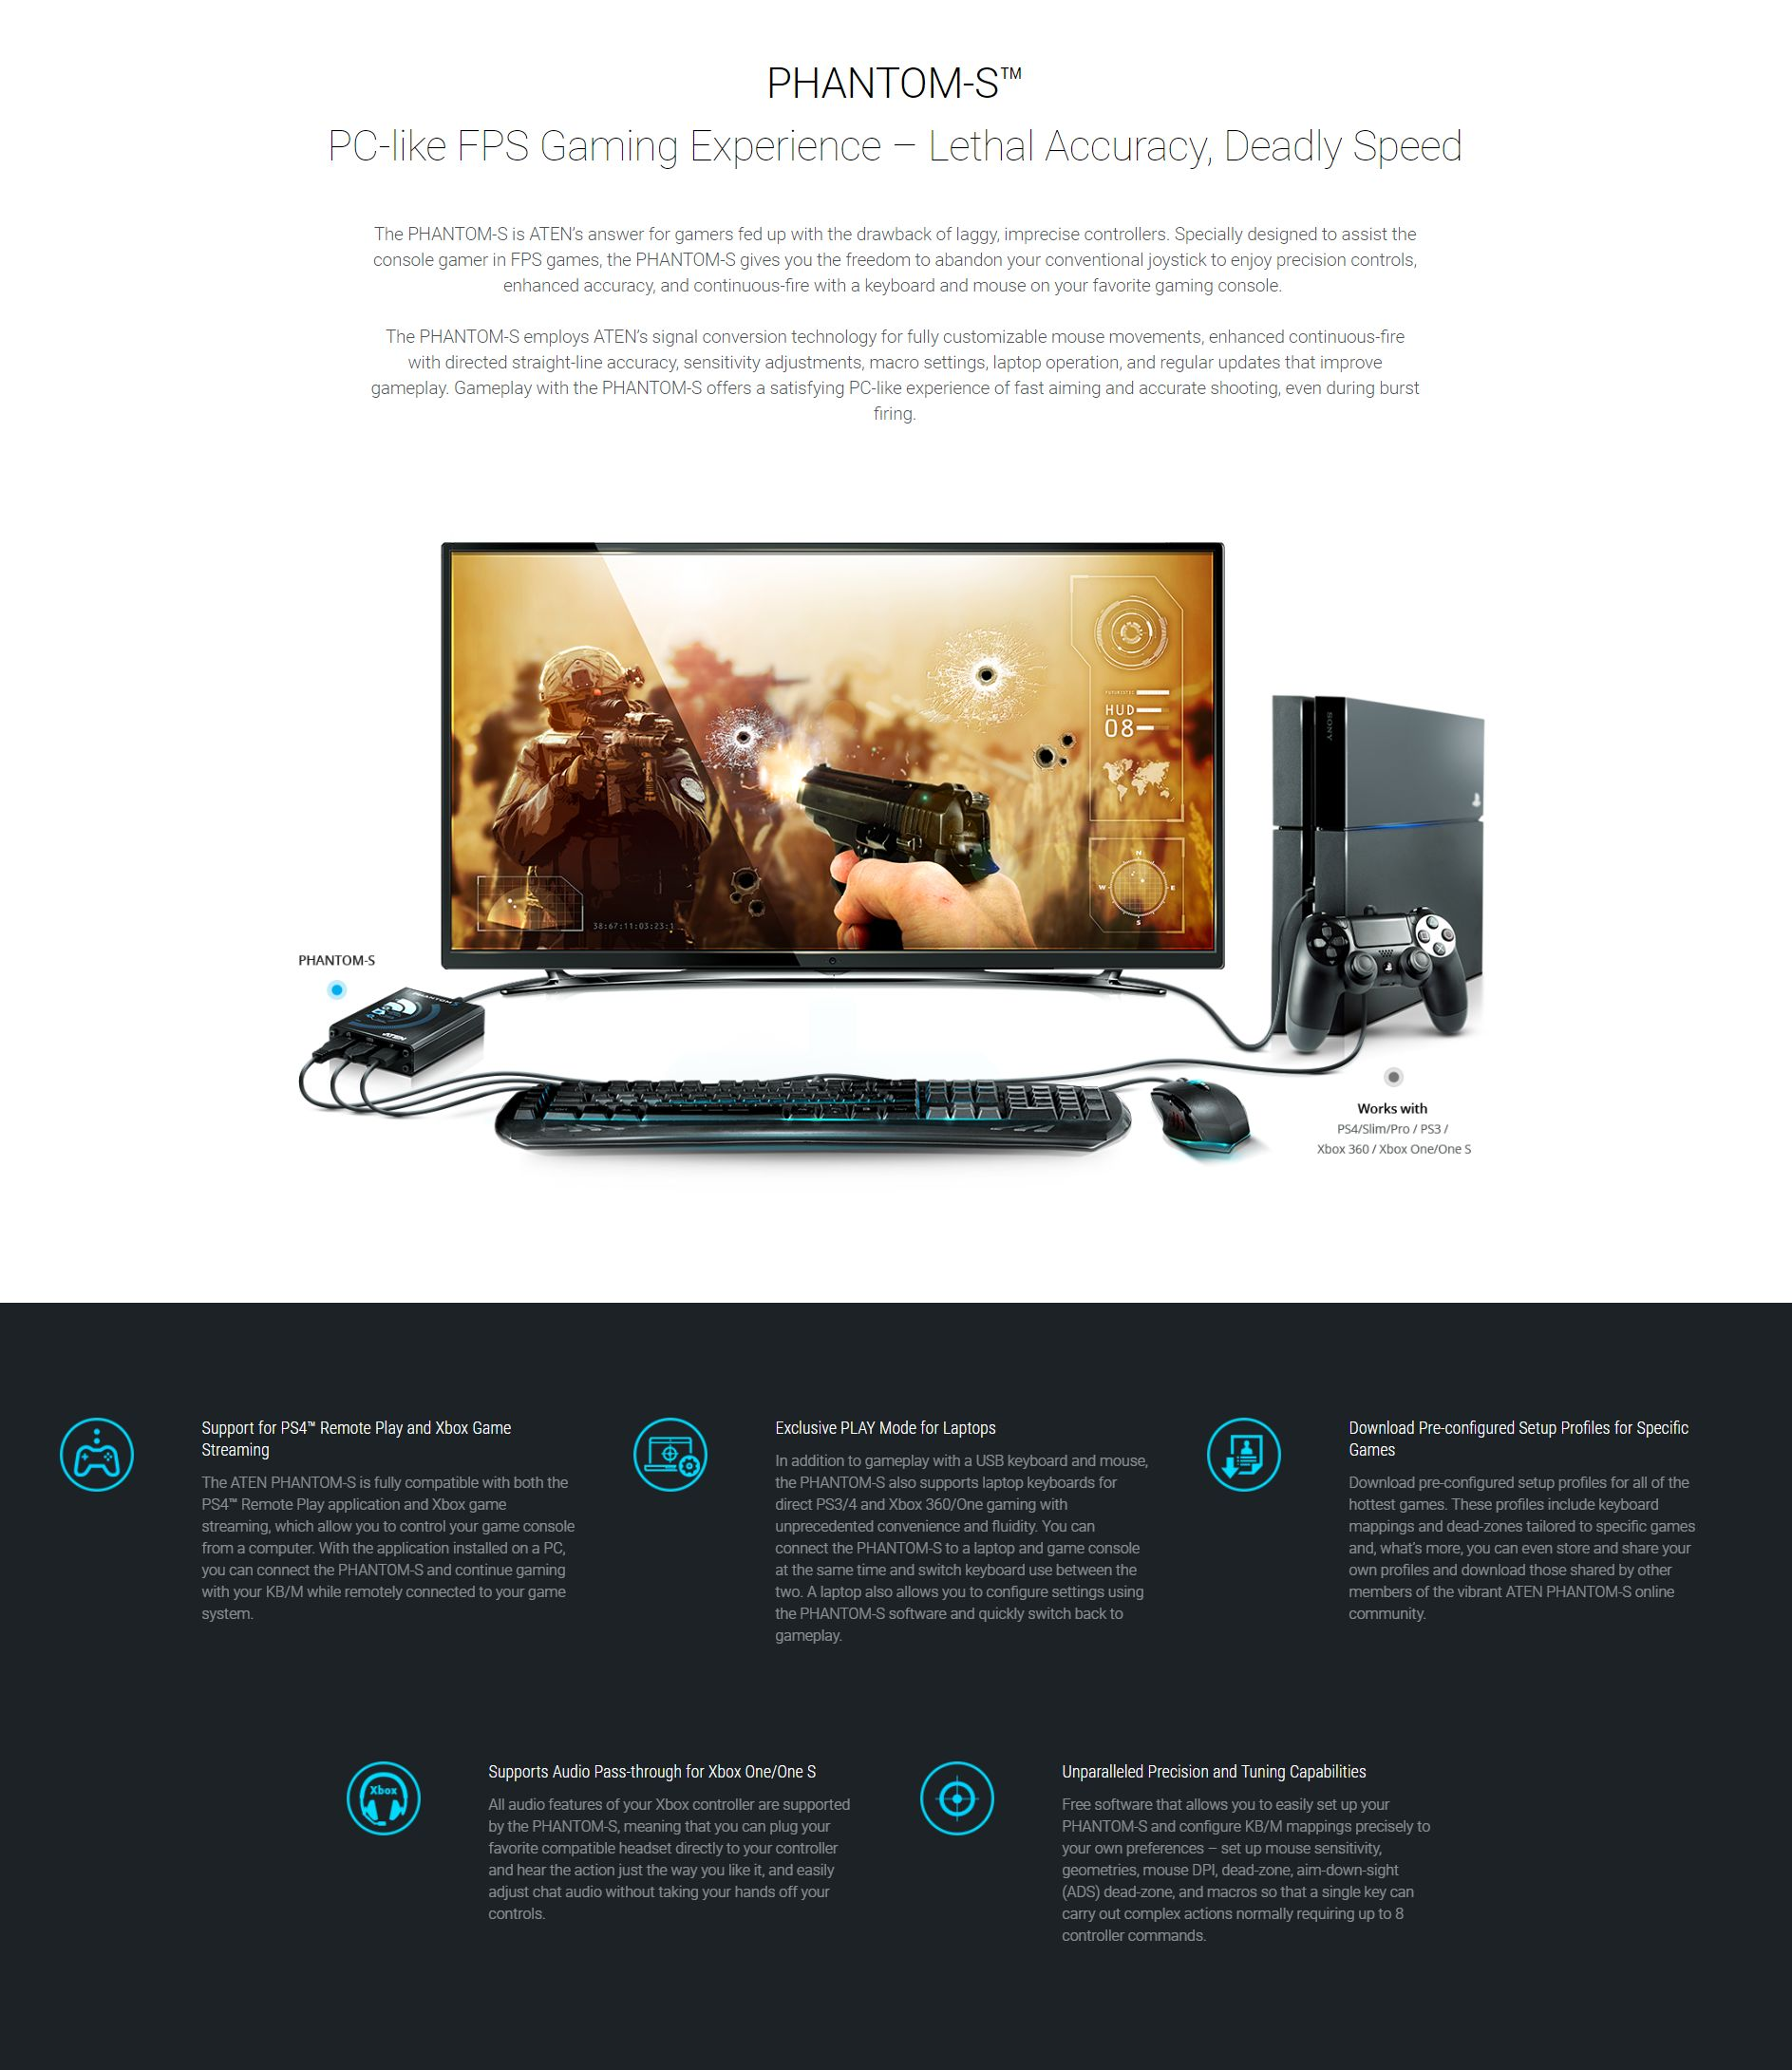 Aten UC3410-AT Phantom-S Gamepad Emulator for PS4 / PS3/ Xbox 360/ Xbox One